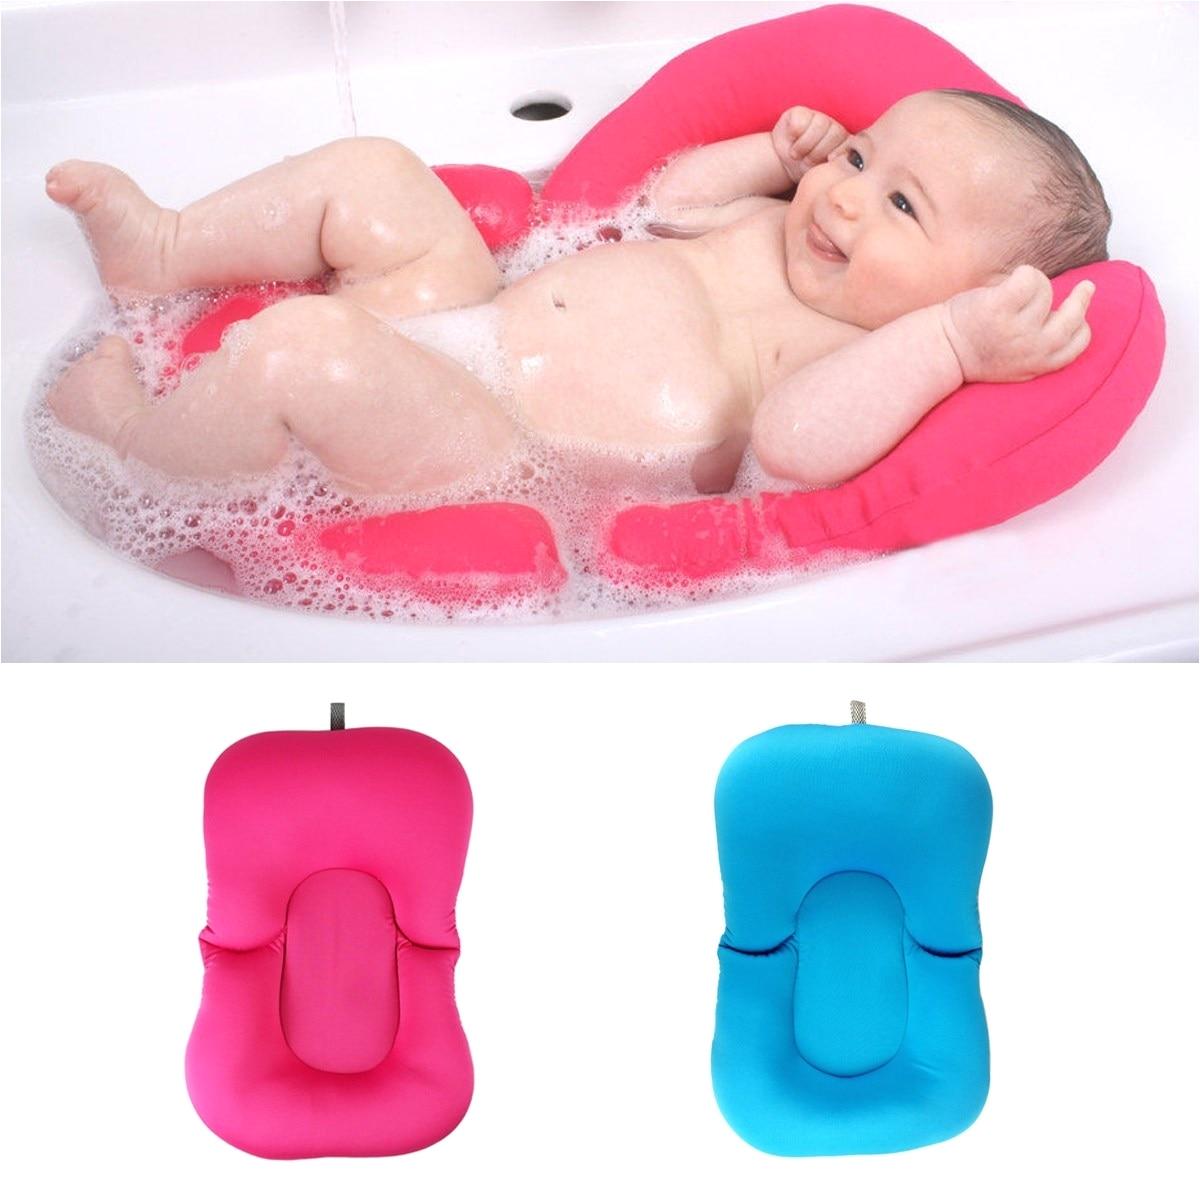 Bathtub Seat for Babies Hot Sales Newborn Baby Bath Tub Pillow Pad Infant Lounger Air